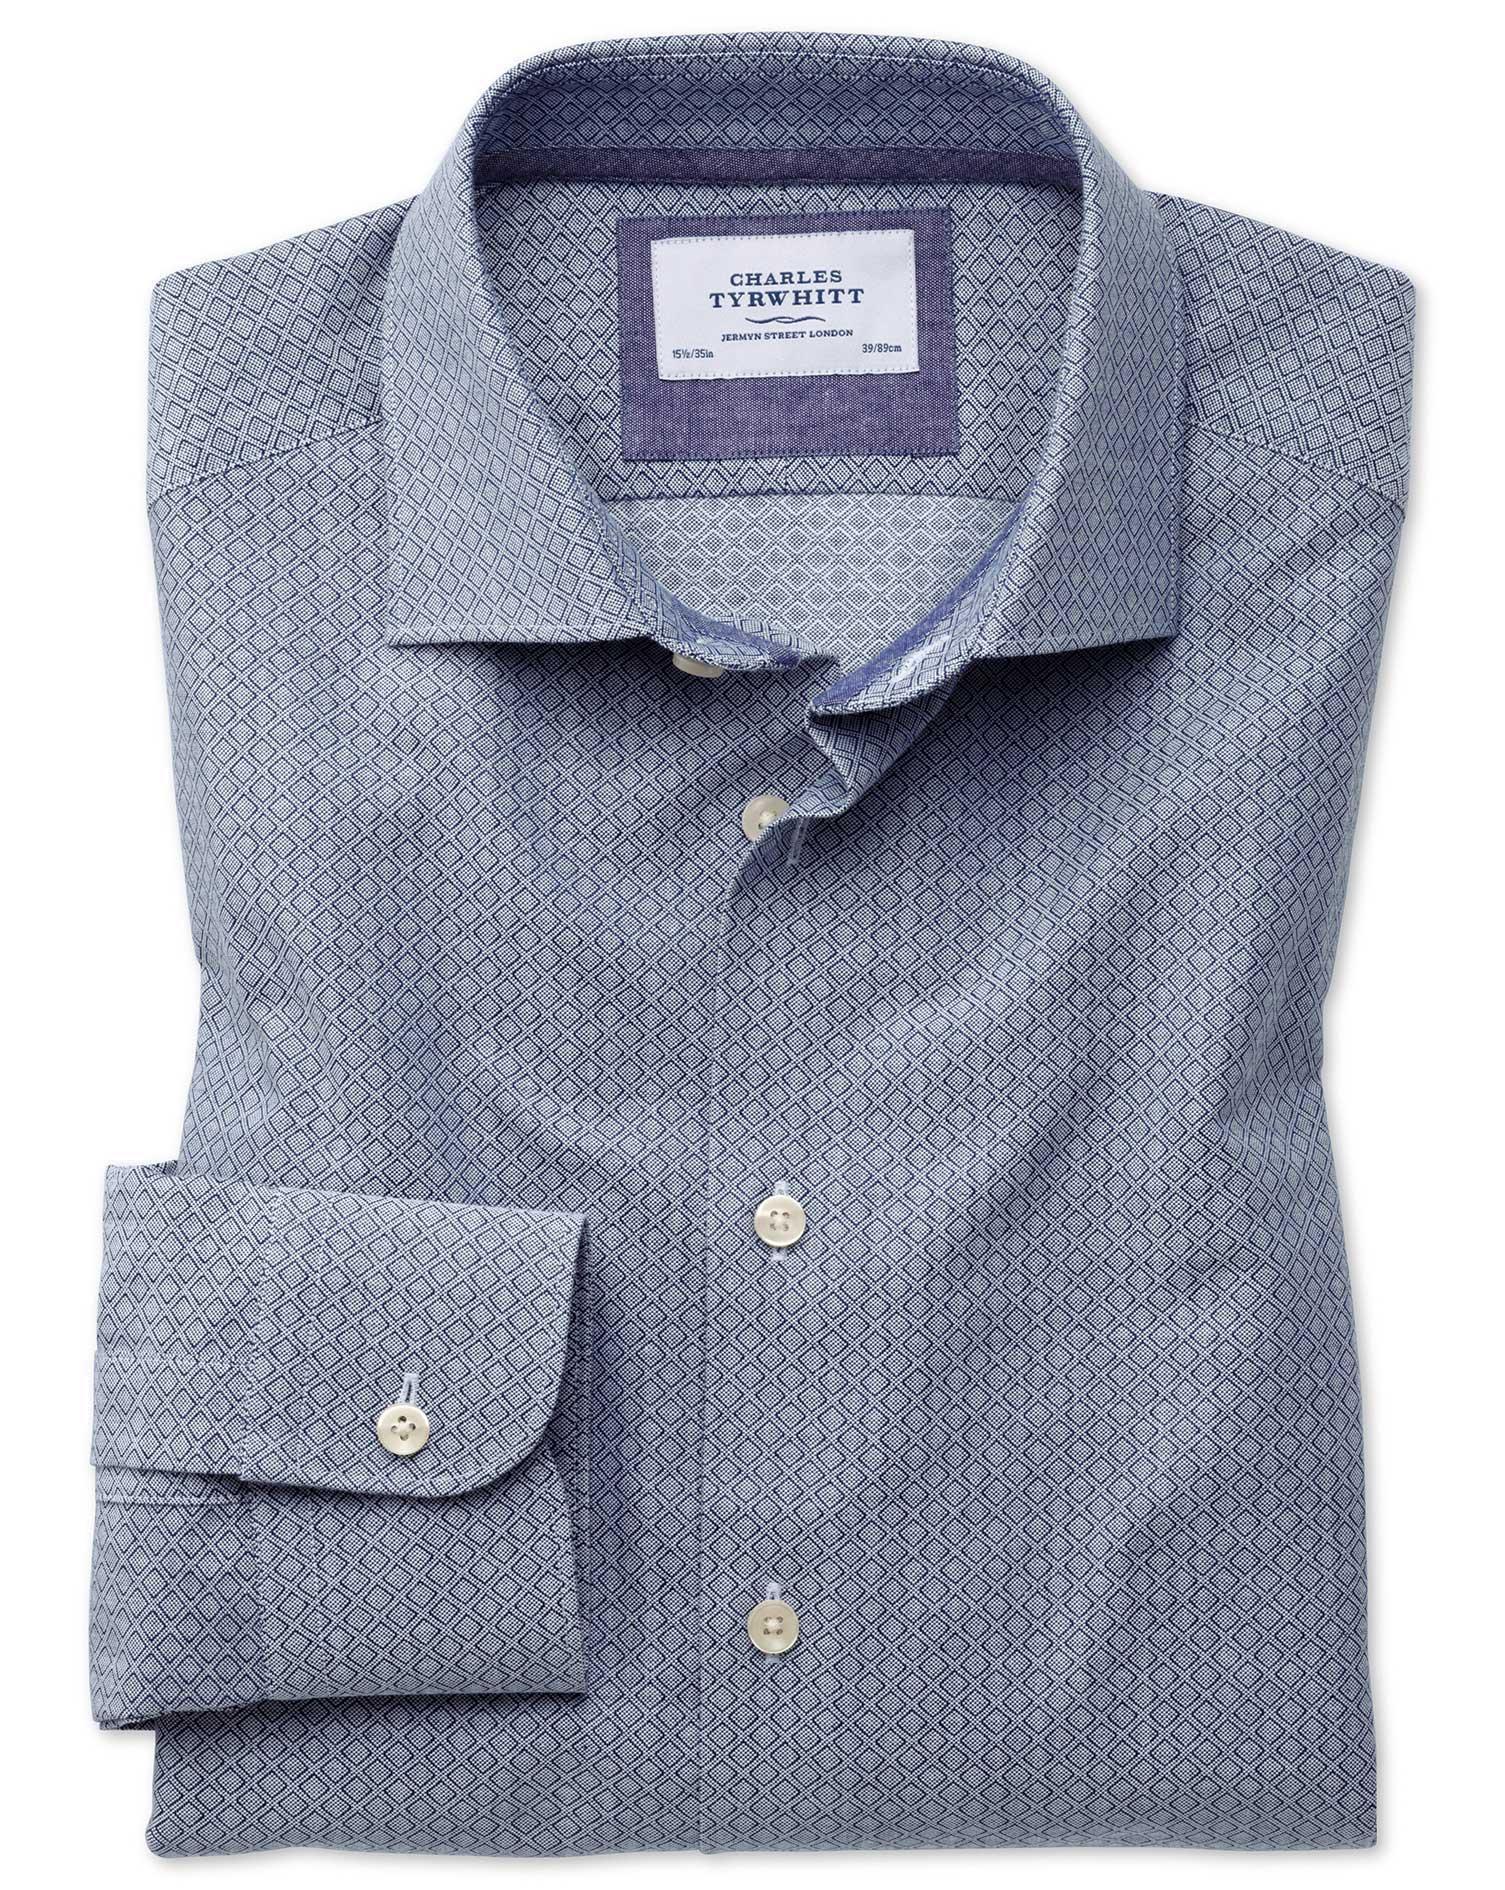 Slim Fit Semi-Cutaway Business Casual Diamond Texture Navy and Grey Cotton Formal Shirt Single Cuff